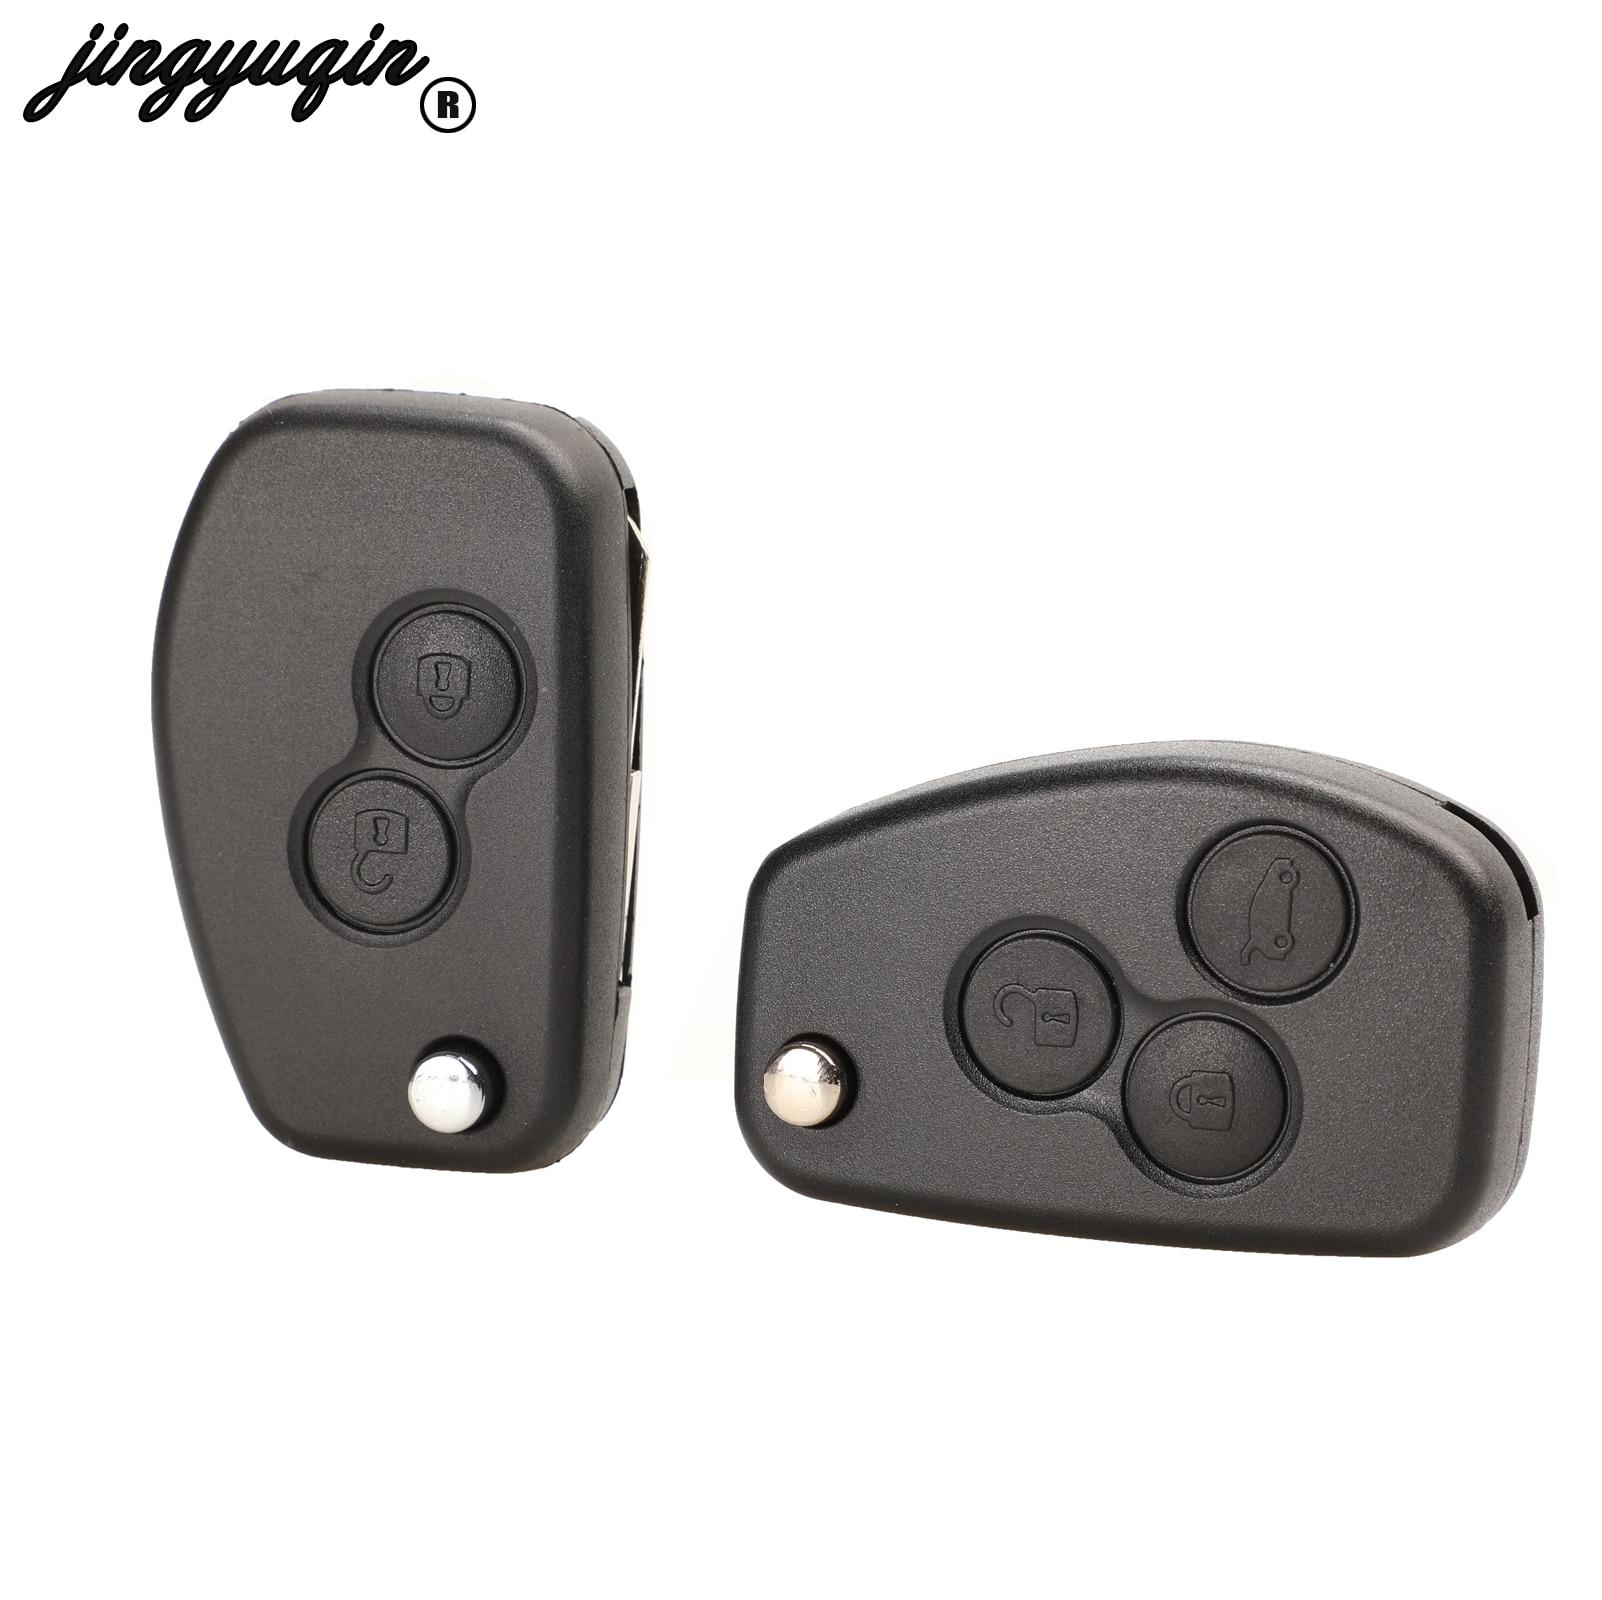 Jingyuqin für Renault Megane Dacia Modus Espace Duster Clio Geändert Schlüssel 2 Tasten Flip Folding Remote Key Abdeckung Fall Fob shell